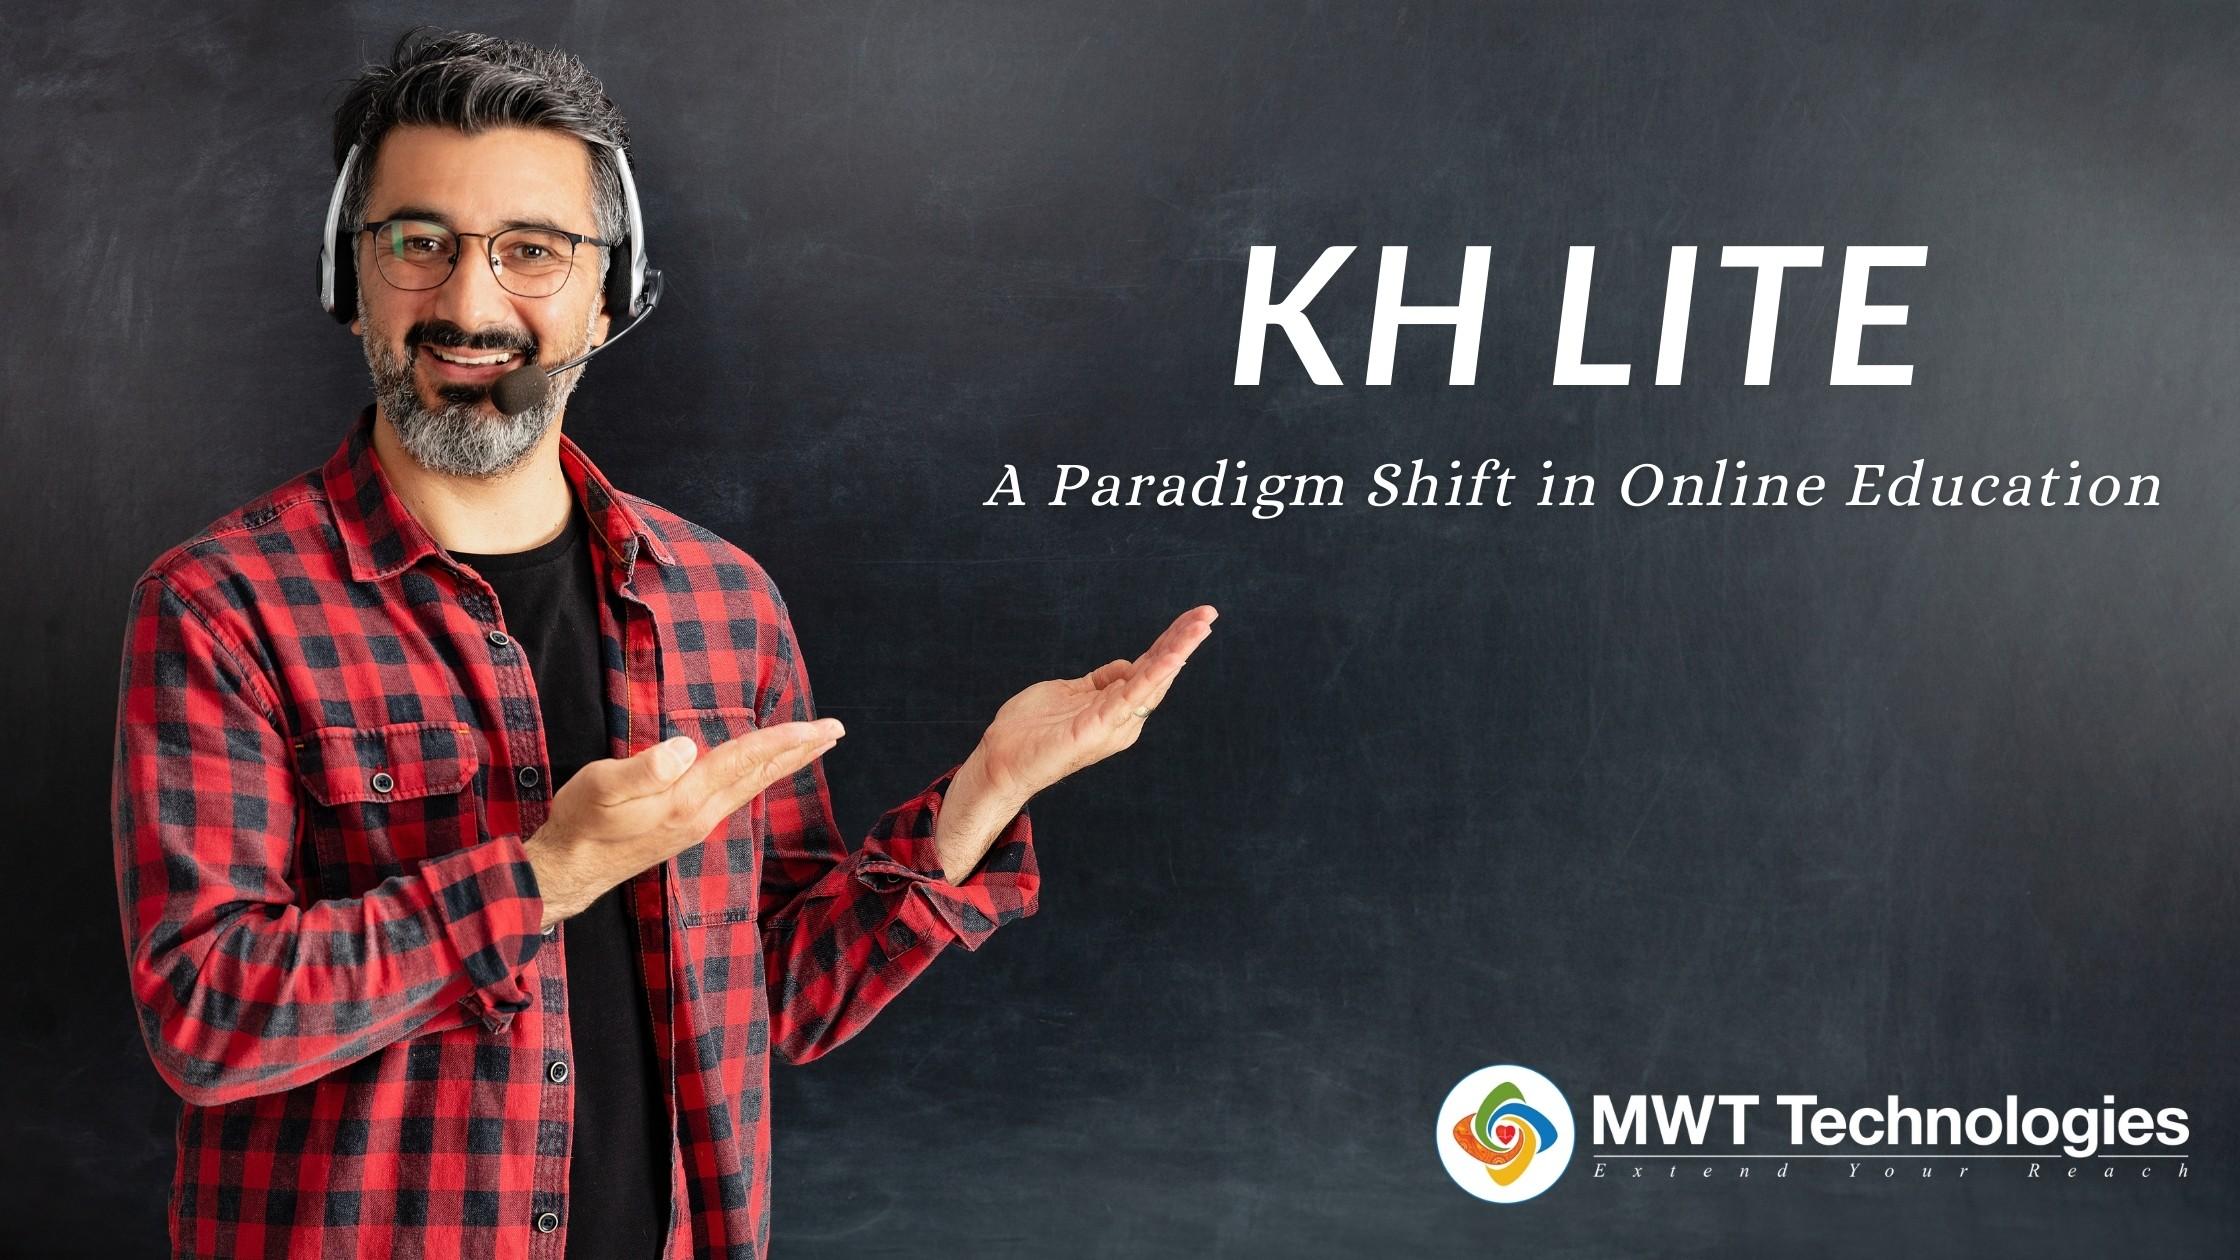 KH Lite: A Paradigm Shift in Online Education